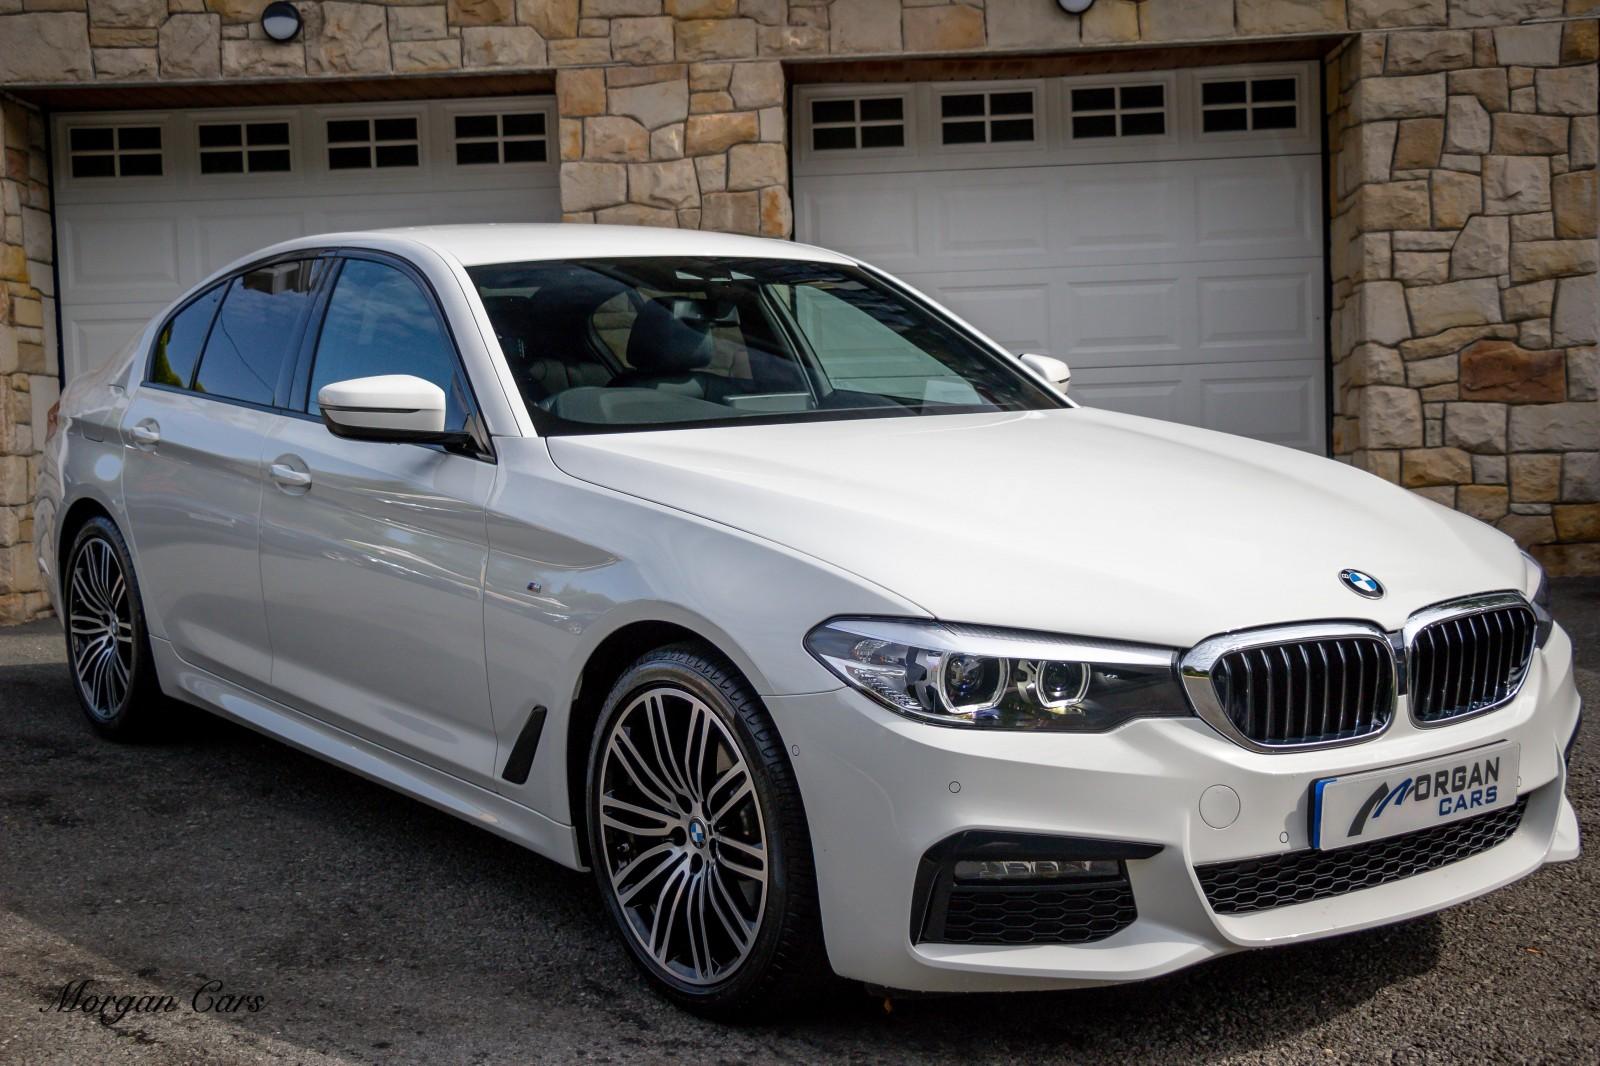 2020 BMW 5 Series 520D M SPORT Diesel Automatic – Morgan Cars 9 Mound Road, Warrenpoint, Newry BT34 3LW, UK full